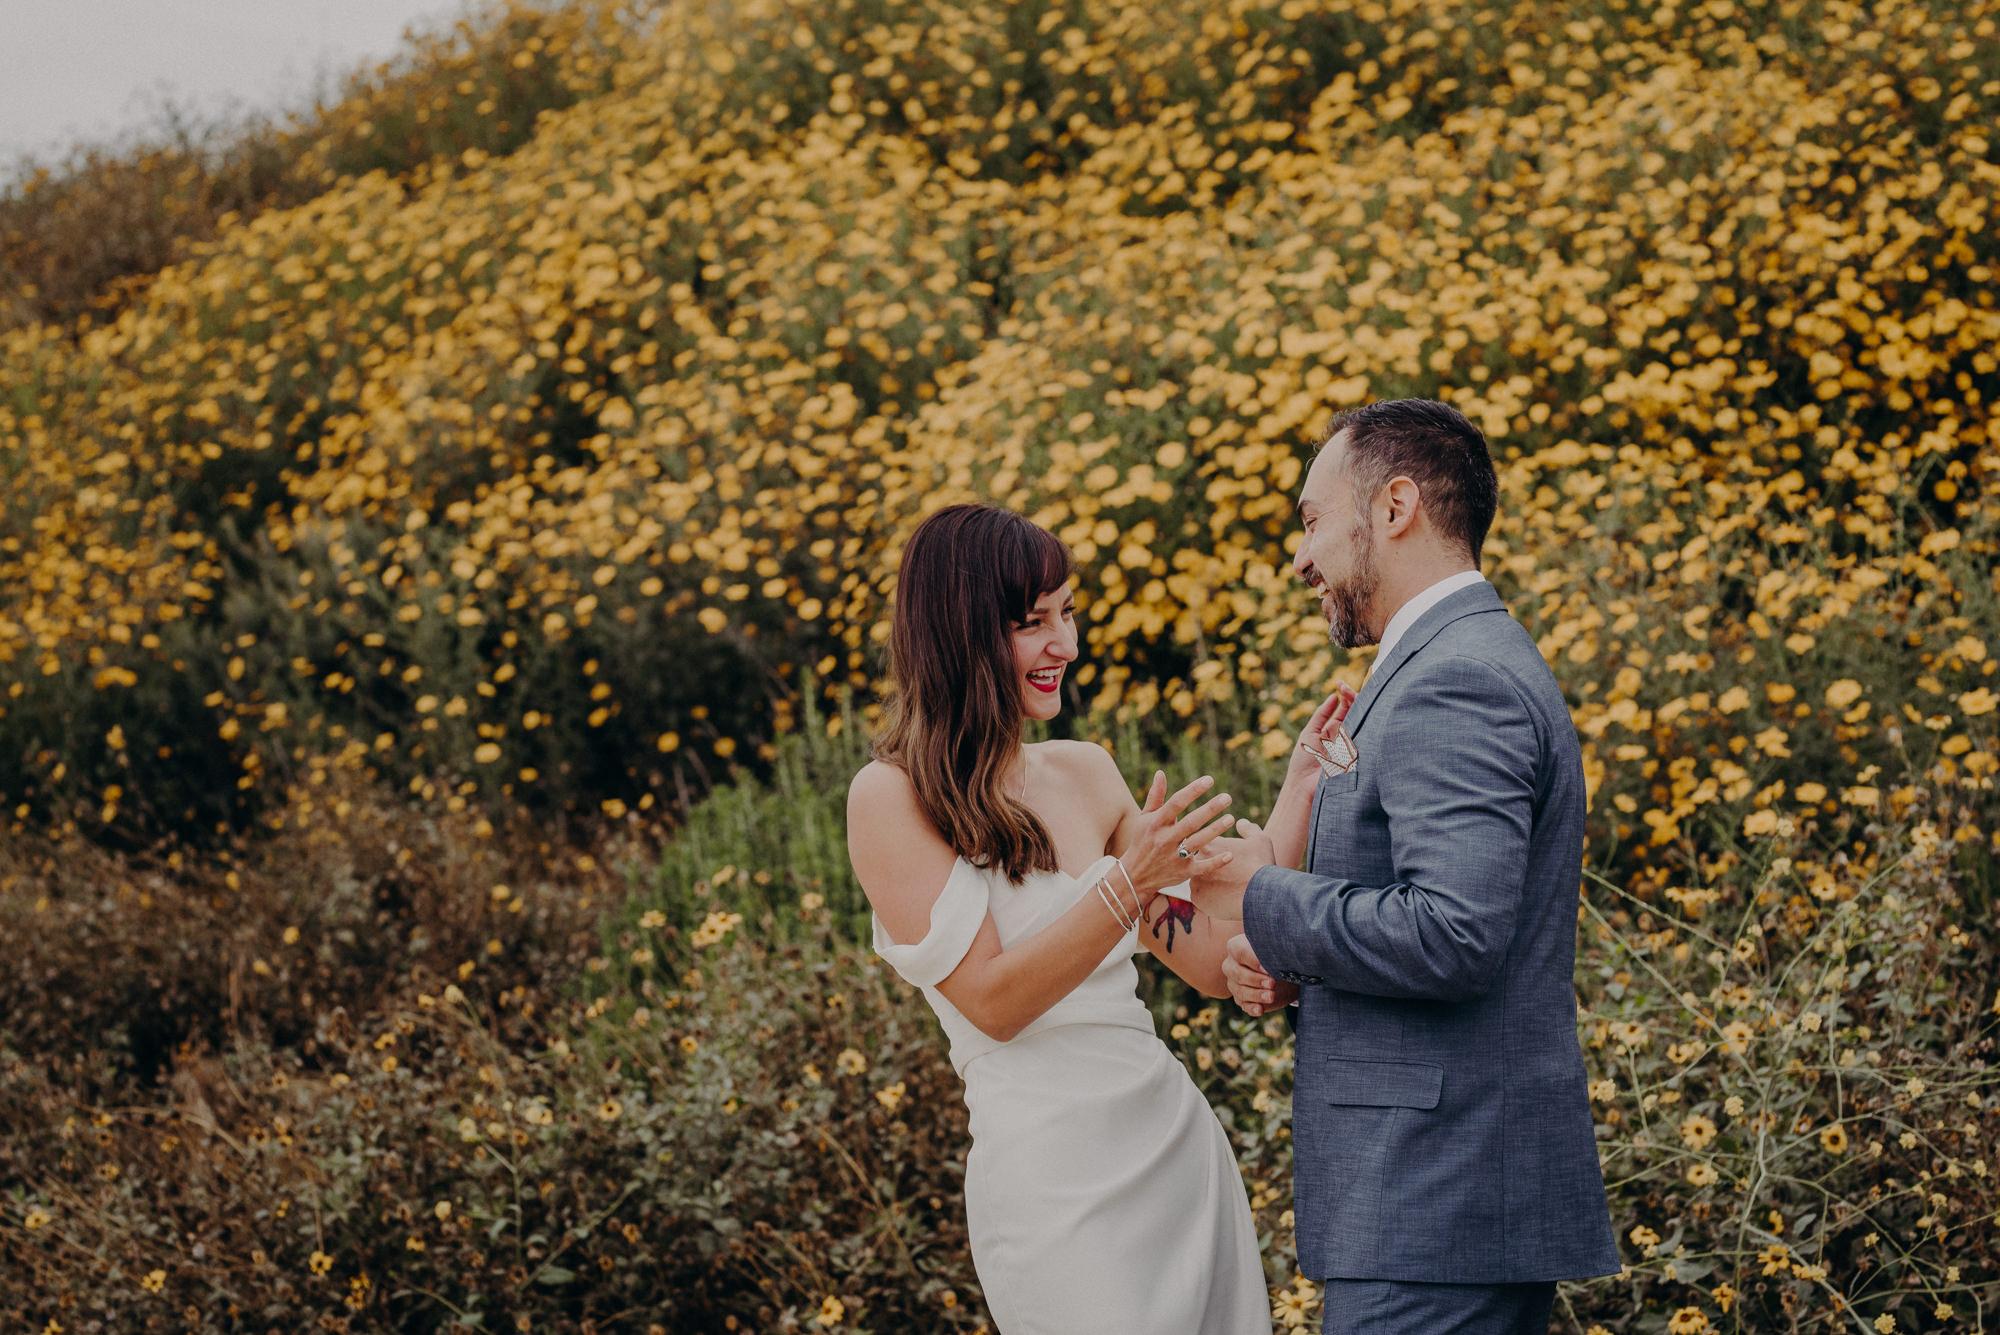 elopement photographer in los angeles - la wedding photographer - isaiahandtaylor.com-013.jpg